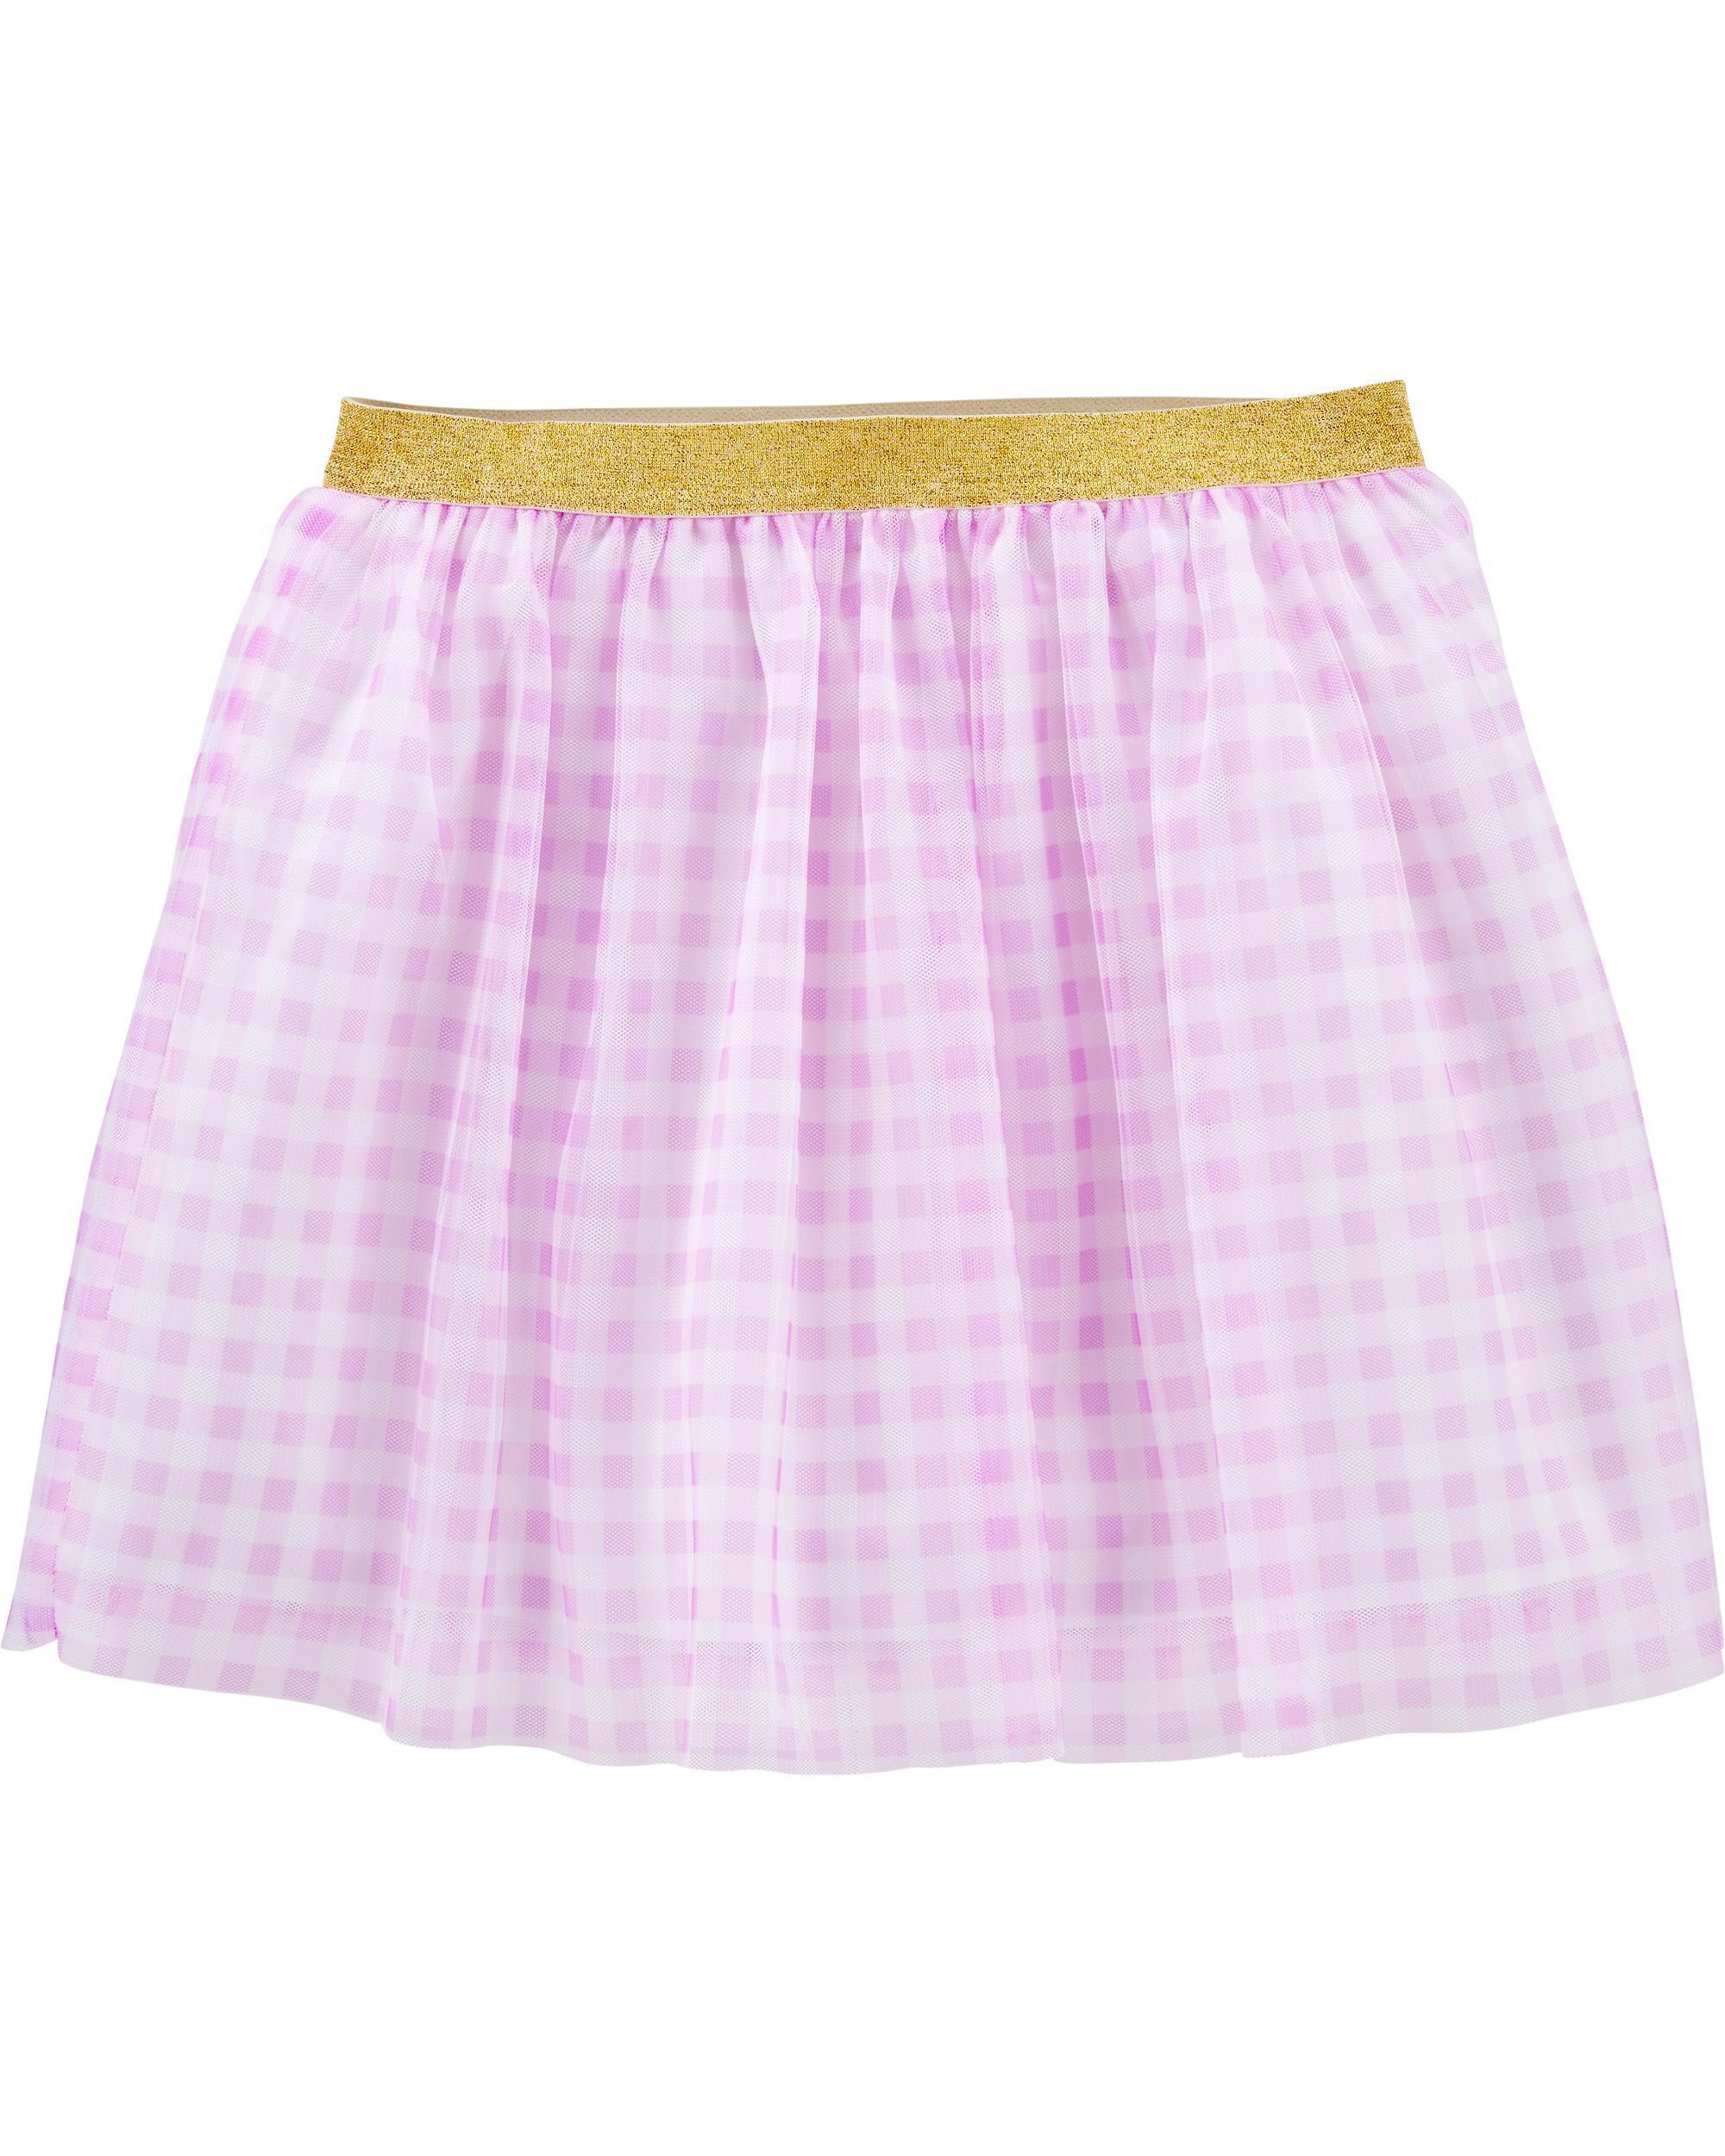 *Clearance*  Glitter Gingham Tutu Skirt